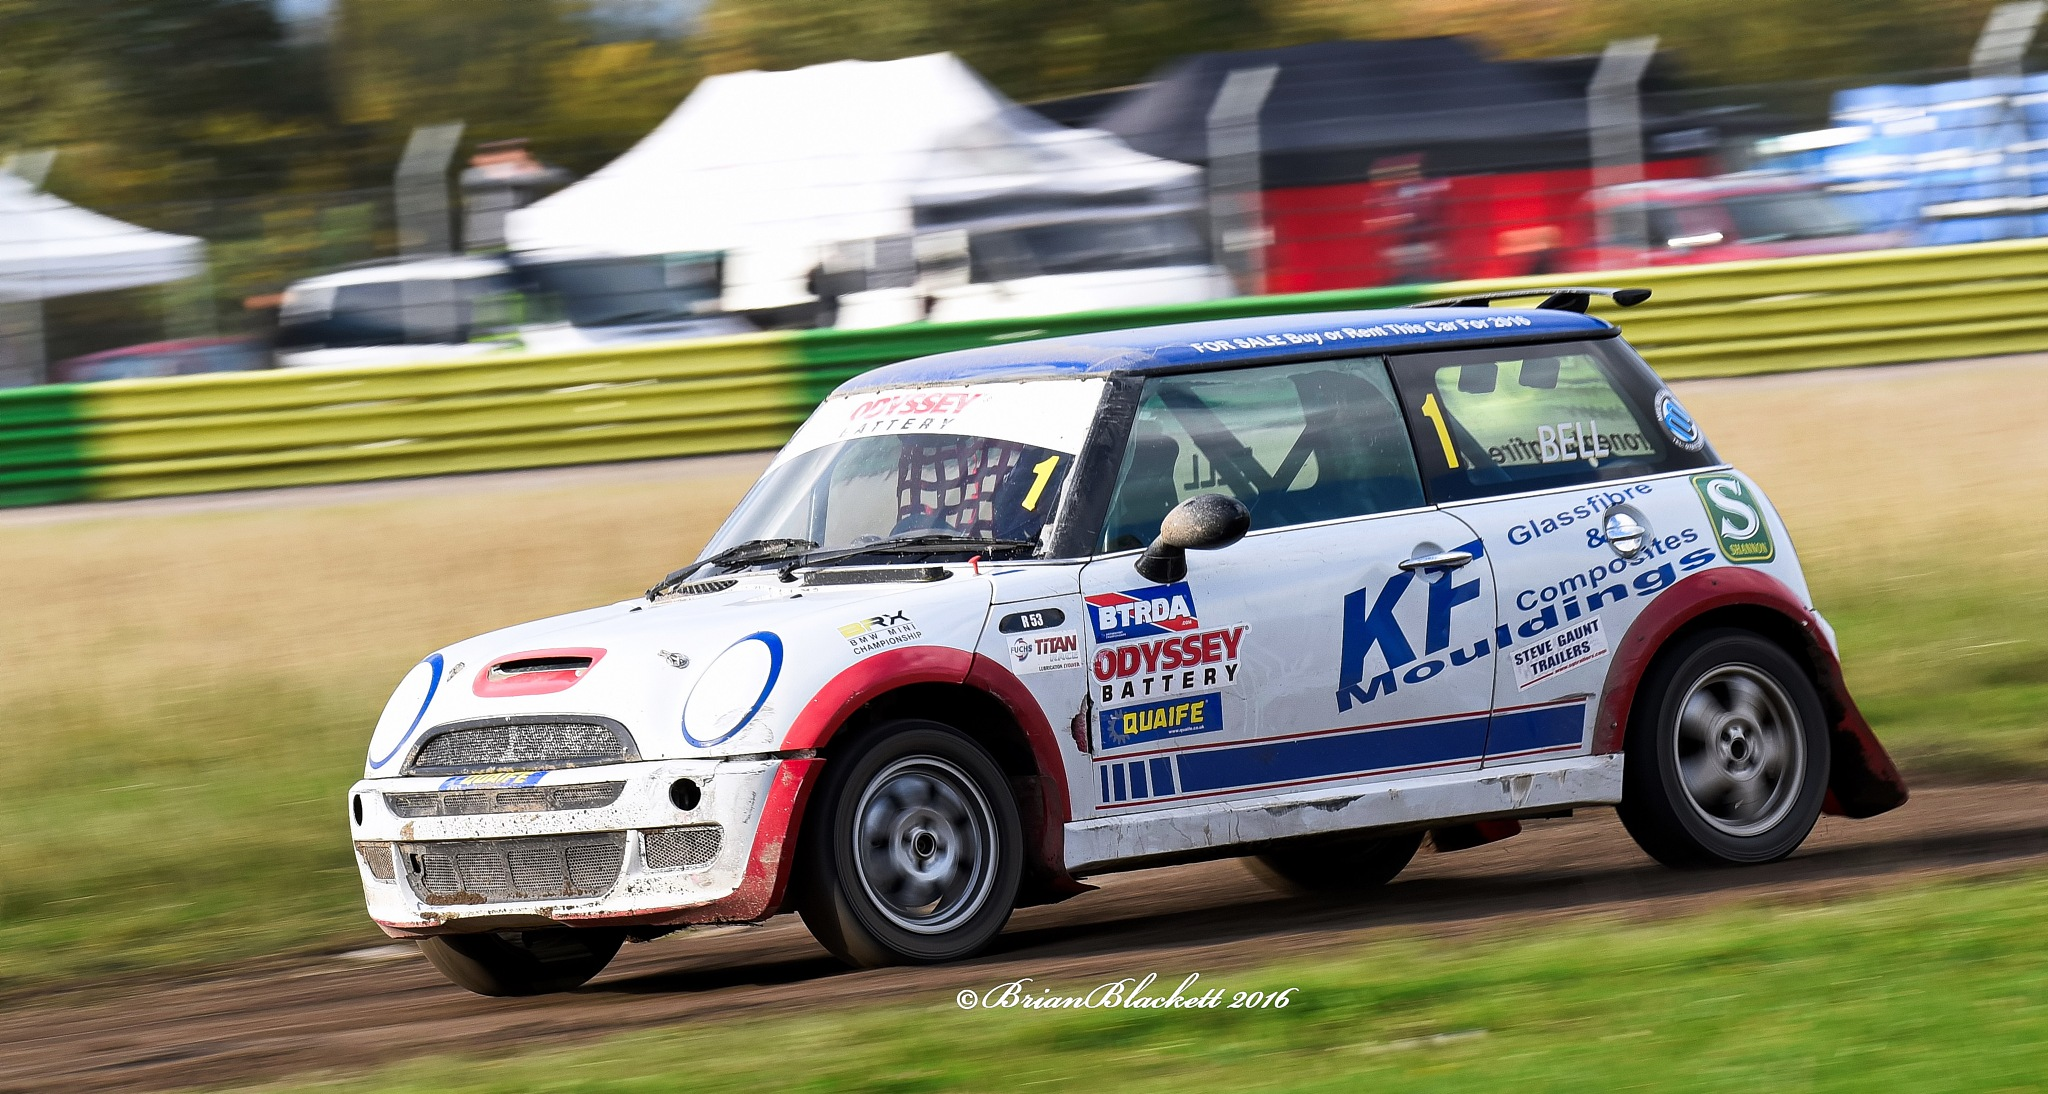 MSA British Rallycross GP Croft North Yorkshire by brianblackett